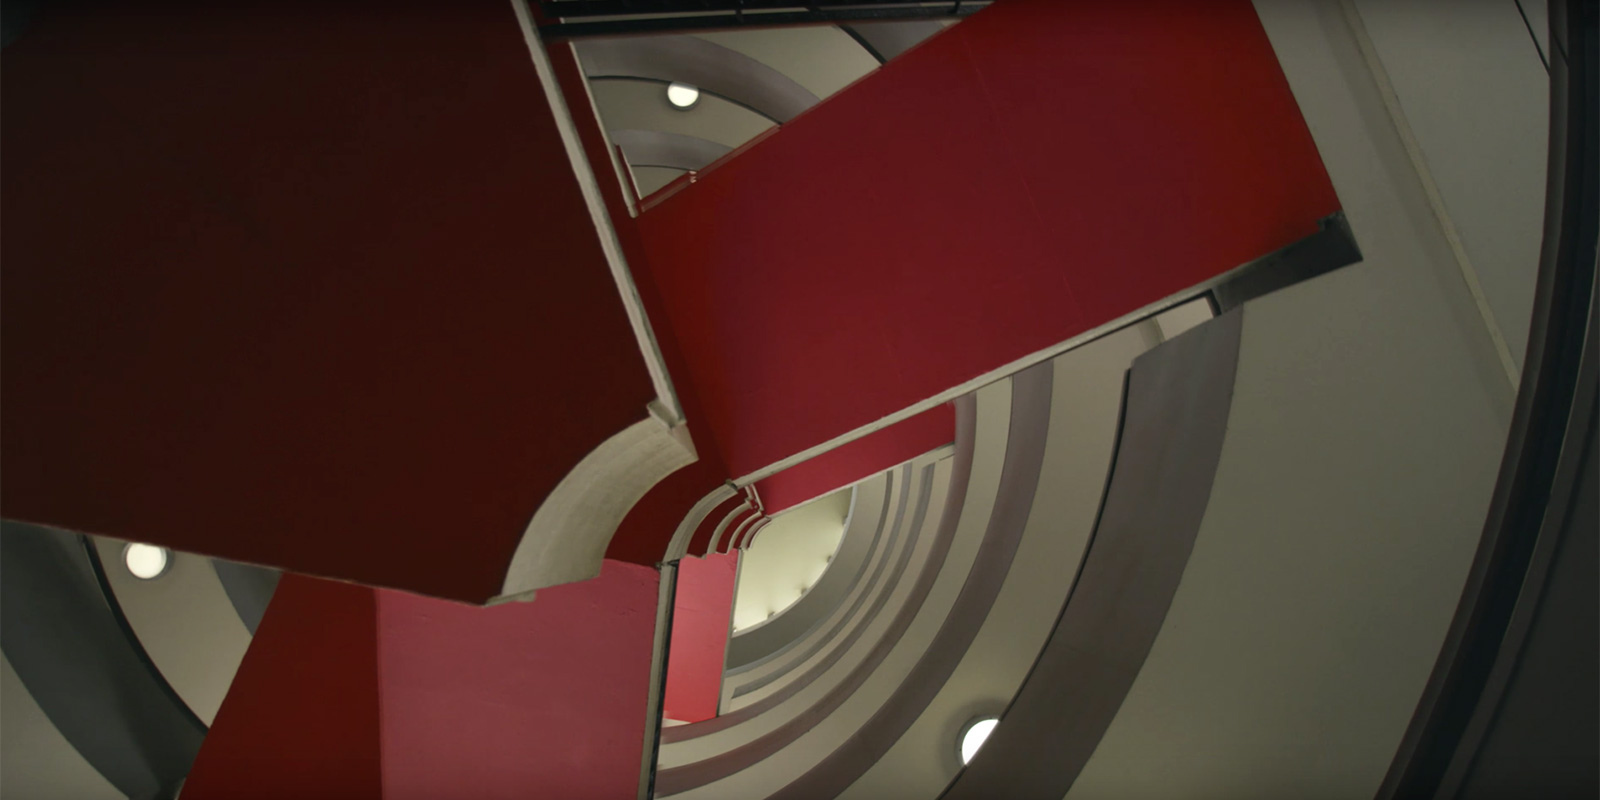 Febueder's music video for Hans